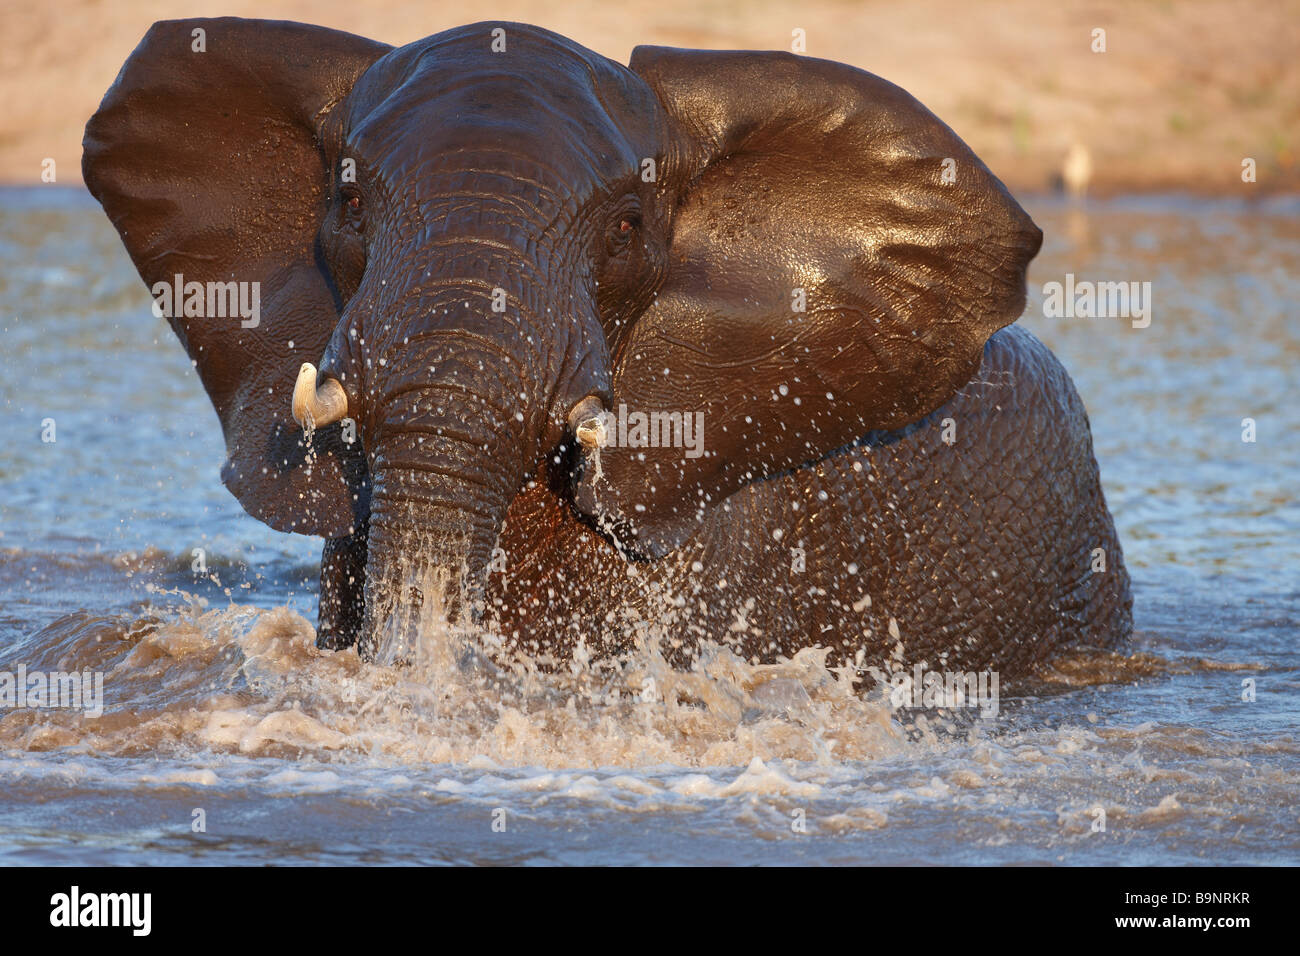 Aggressiva di elefante in un waterhole, Kruger National Park, Sud Africa Immagini Stock